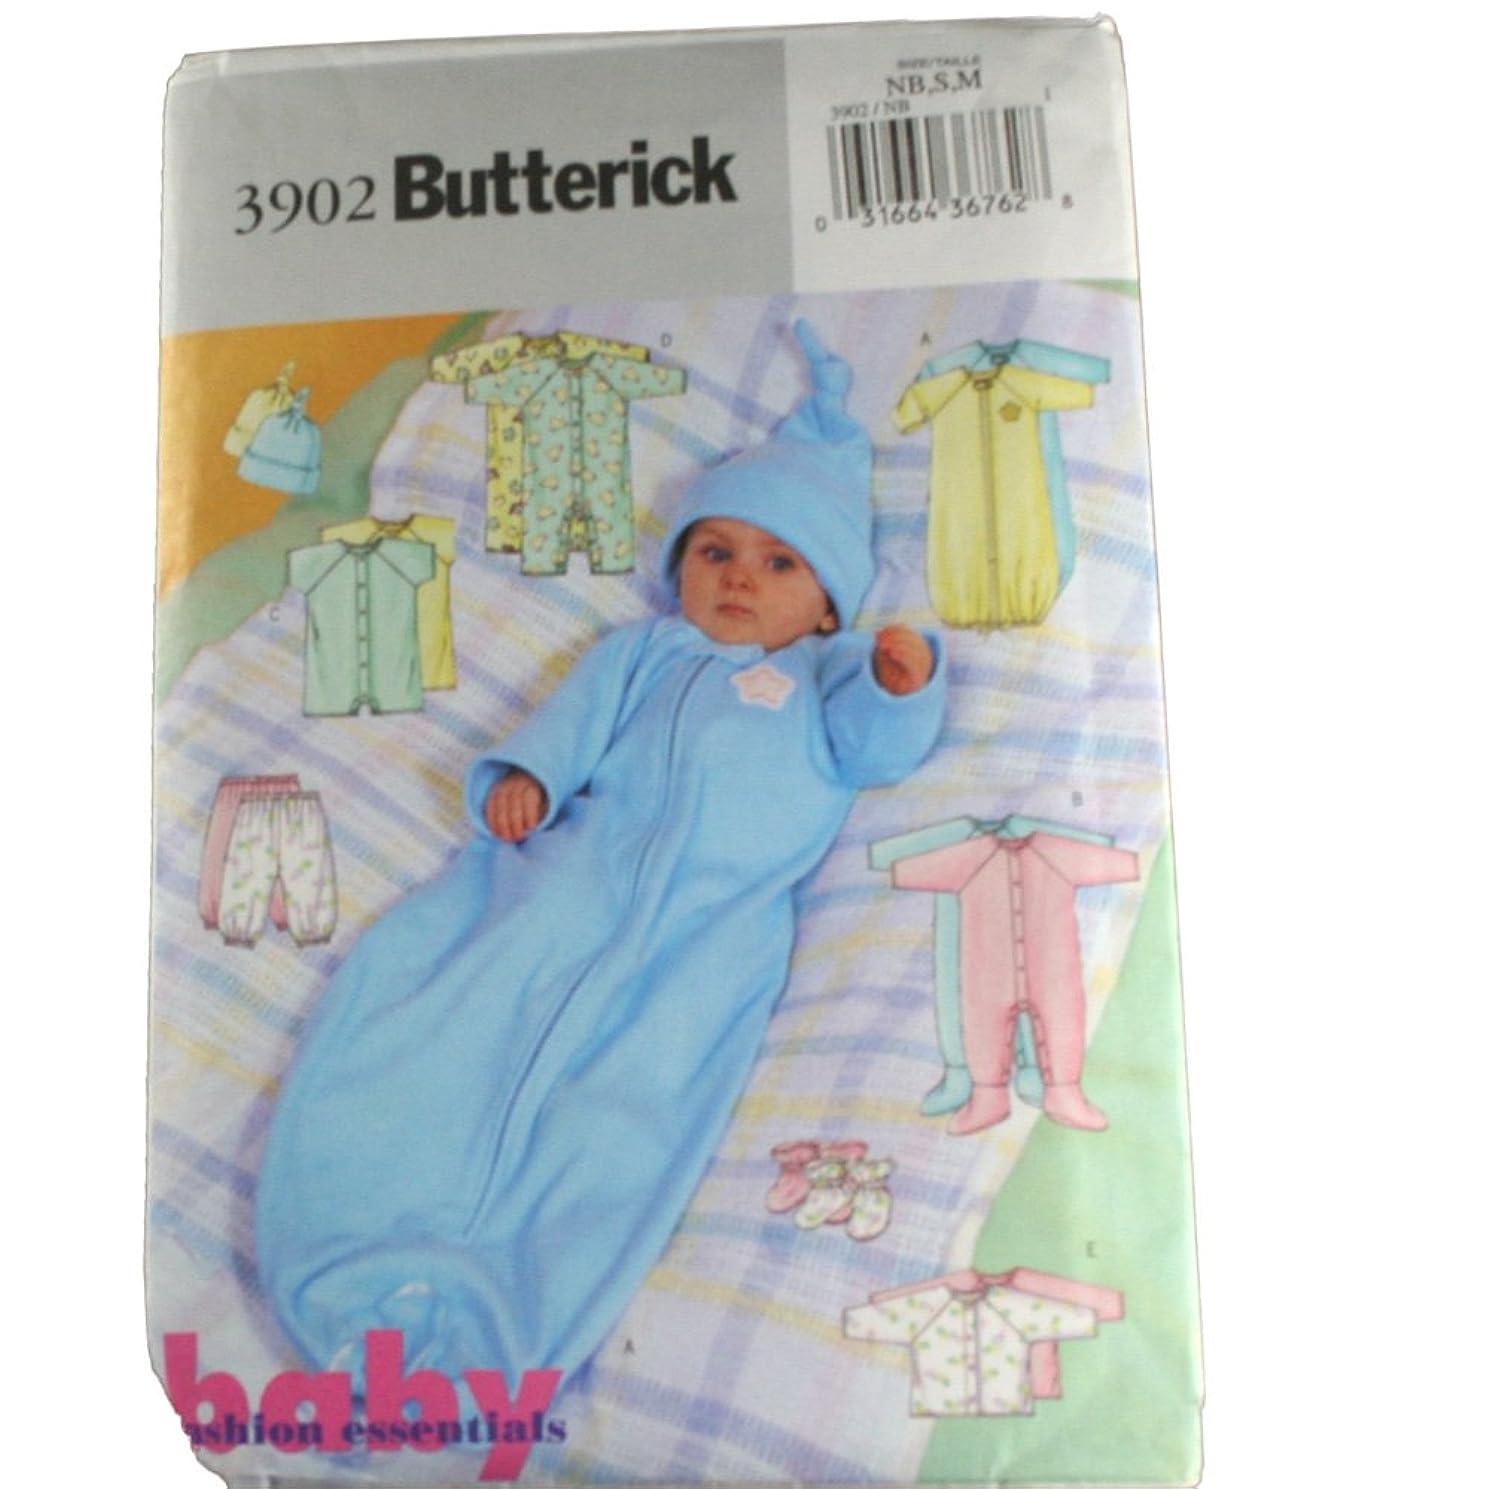 Butterick Sewing Pattern 3902 Infant's Layette Sz NB,S,M